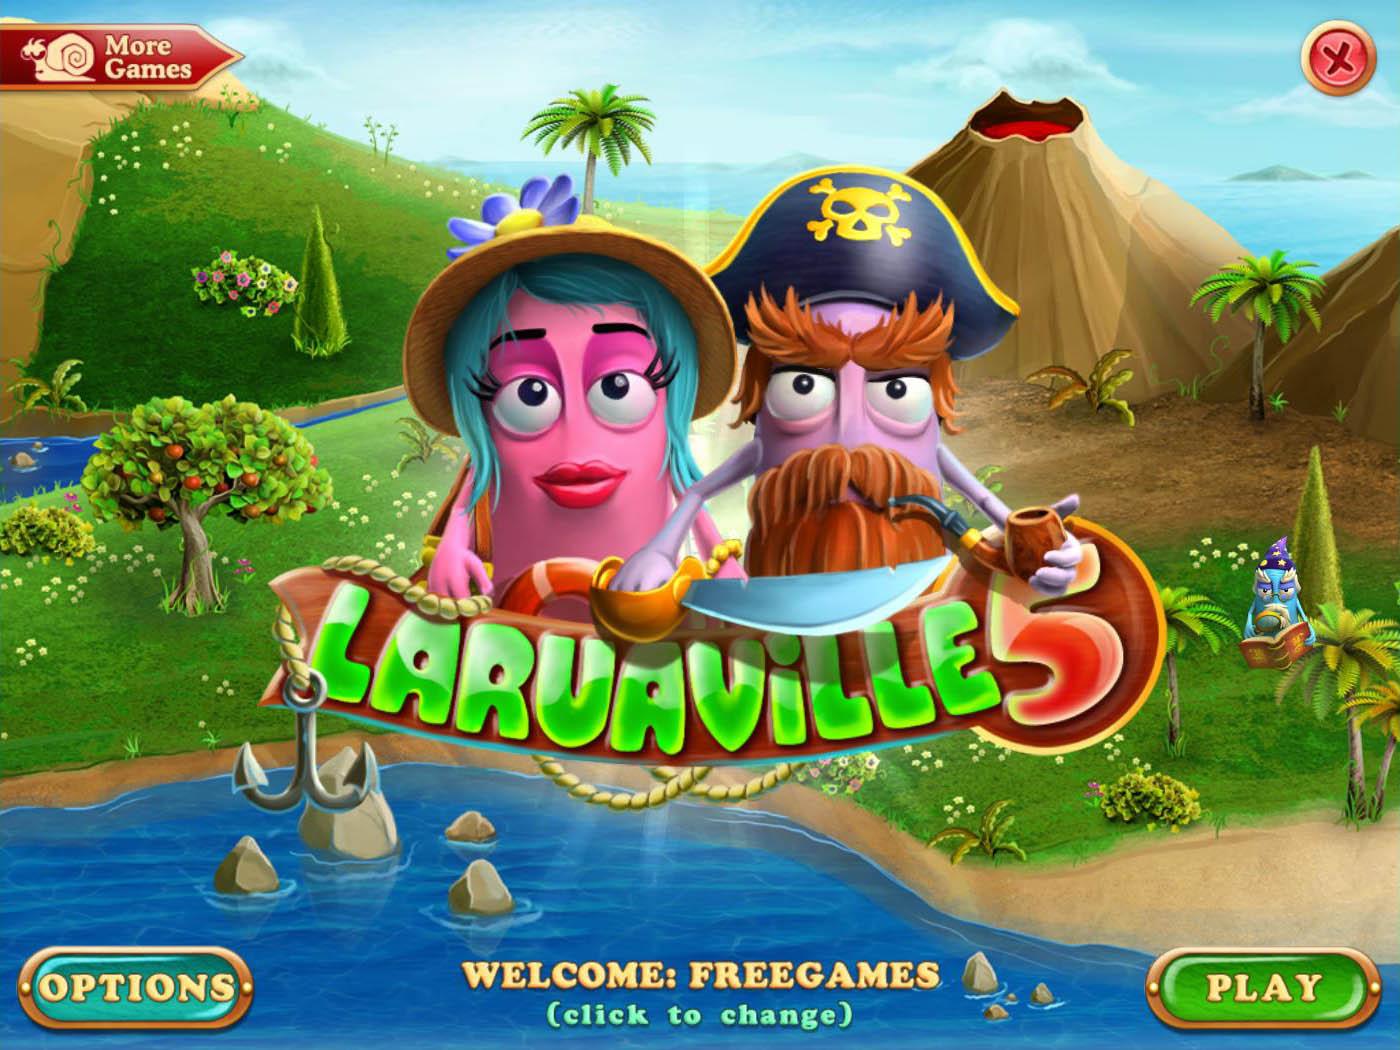 Ларуавиль 5   Laruaville 5 (EN)